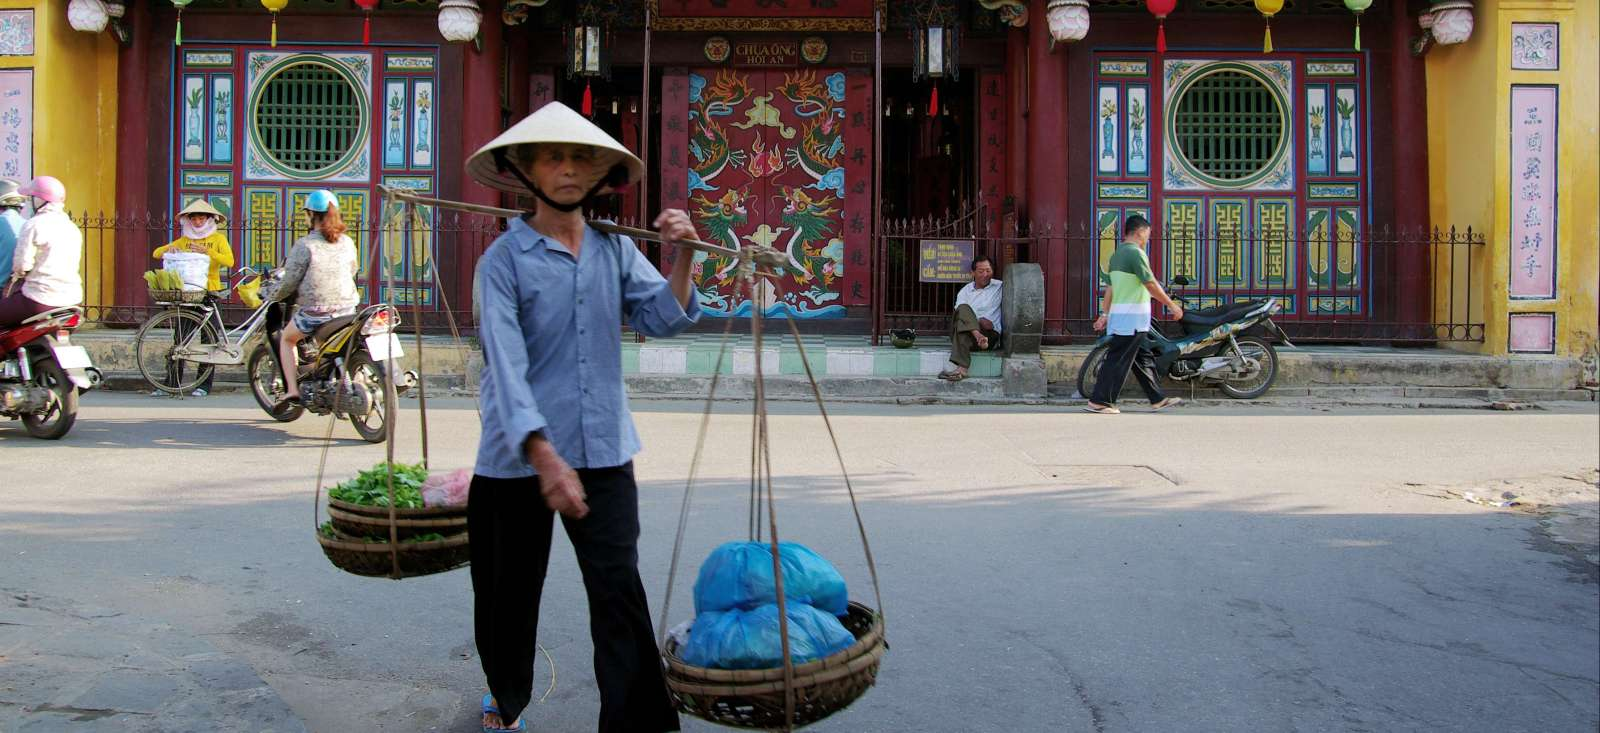 Voyage à pied : Vietnam : Haut Tonkin, Annam et Cochinchine